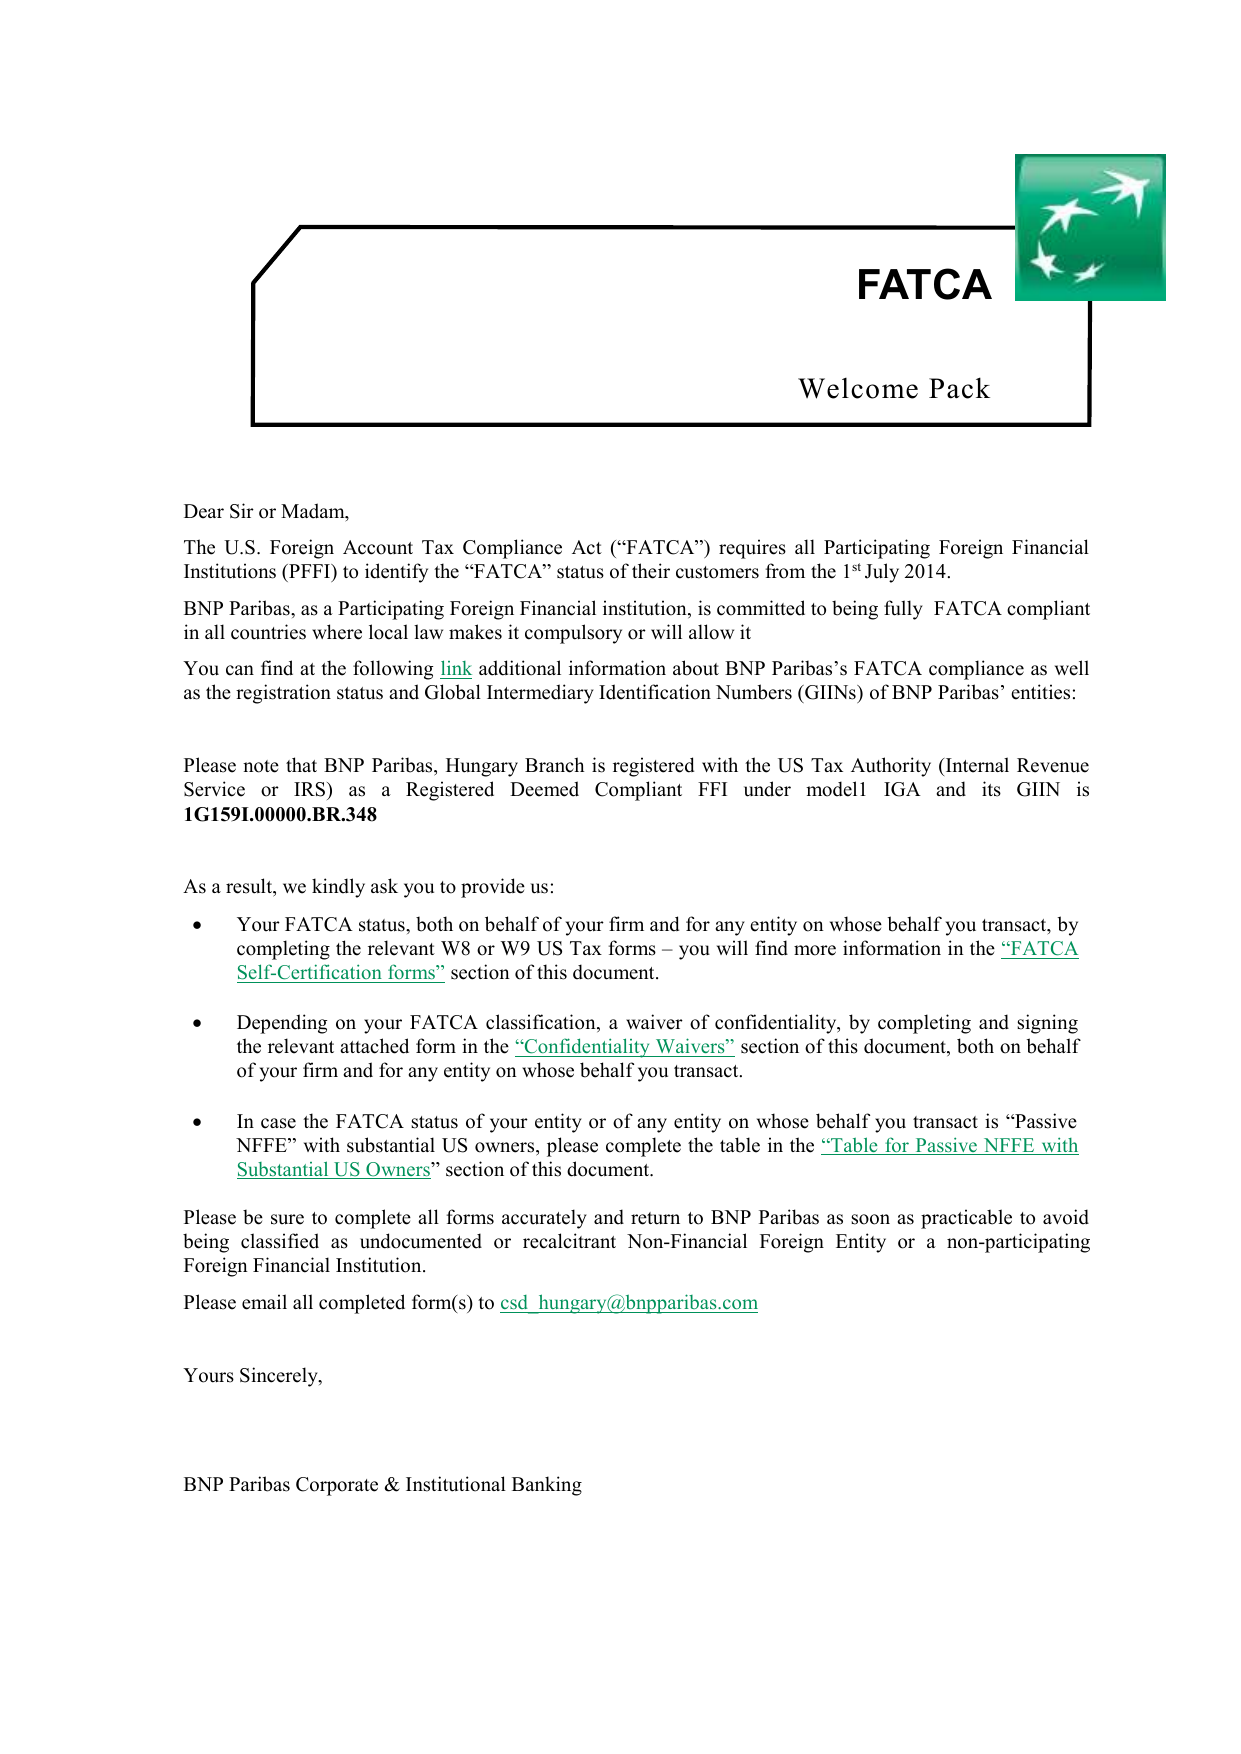 Standard Fatca Client Onboarding Package